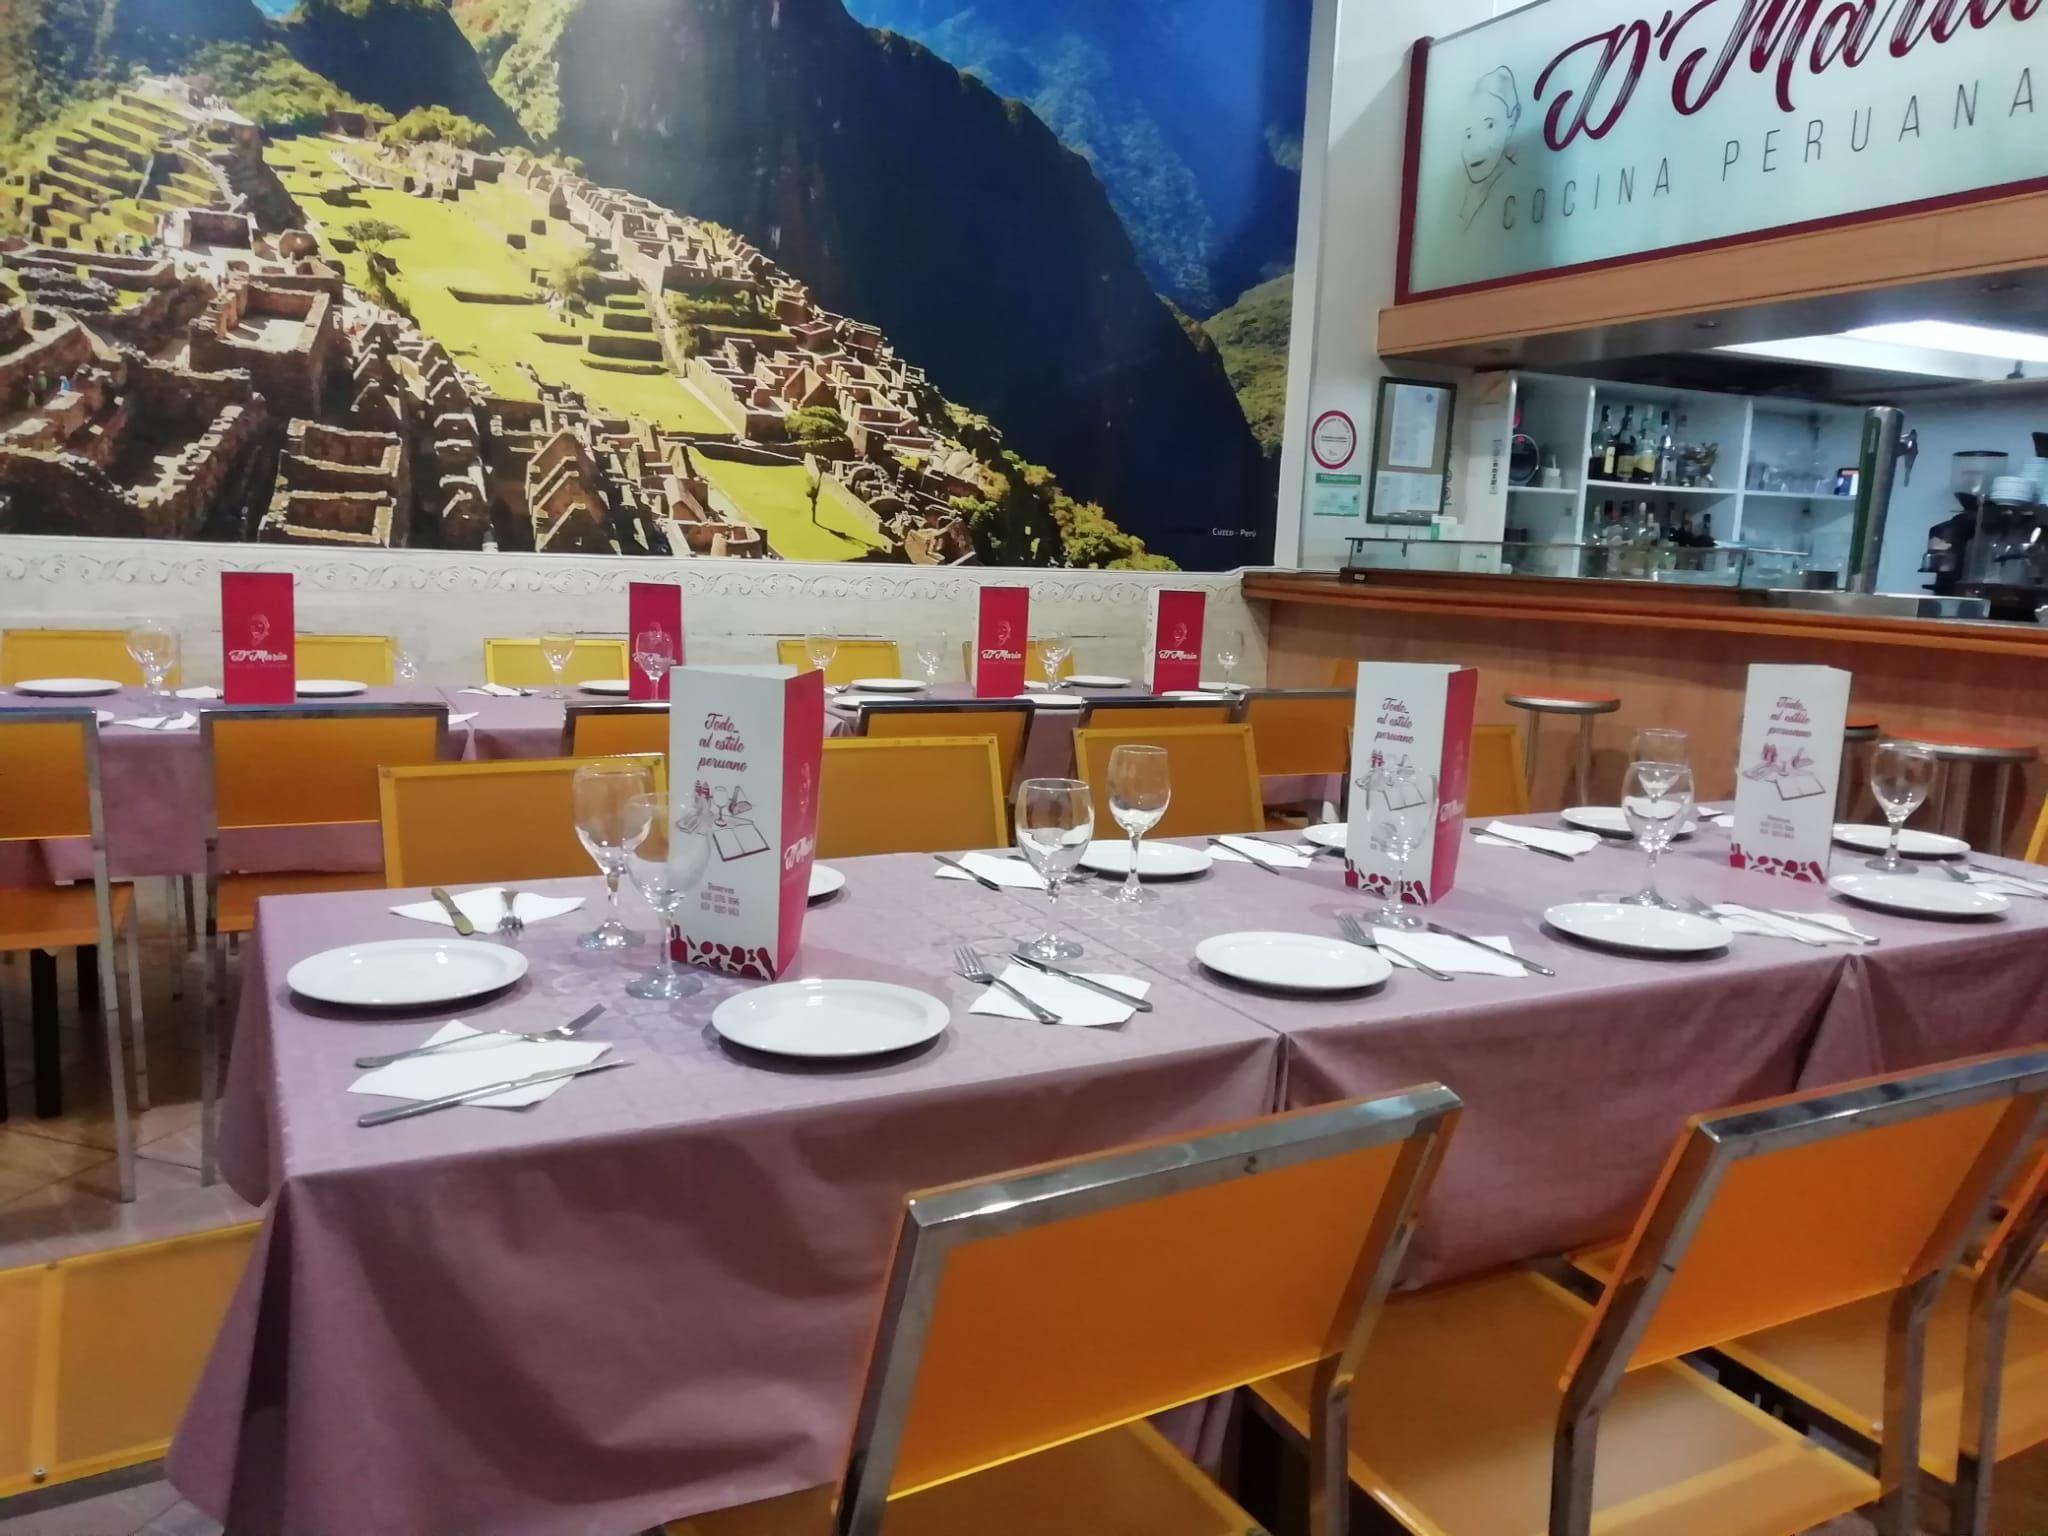 Foto 109 de Cocina peruana en  | TIKA MARIYA